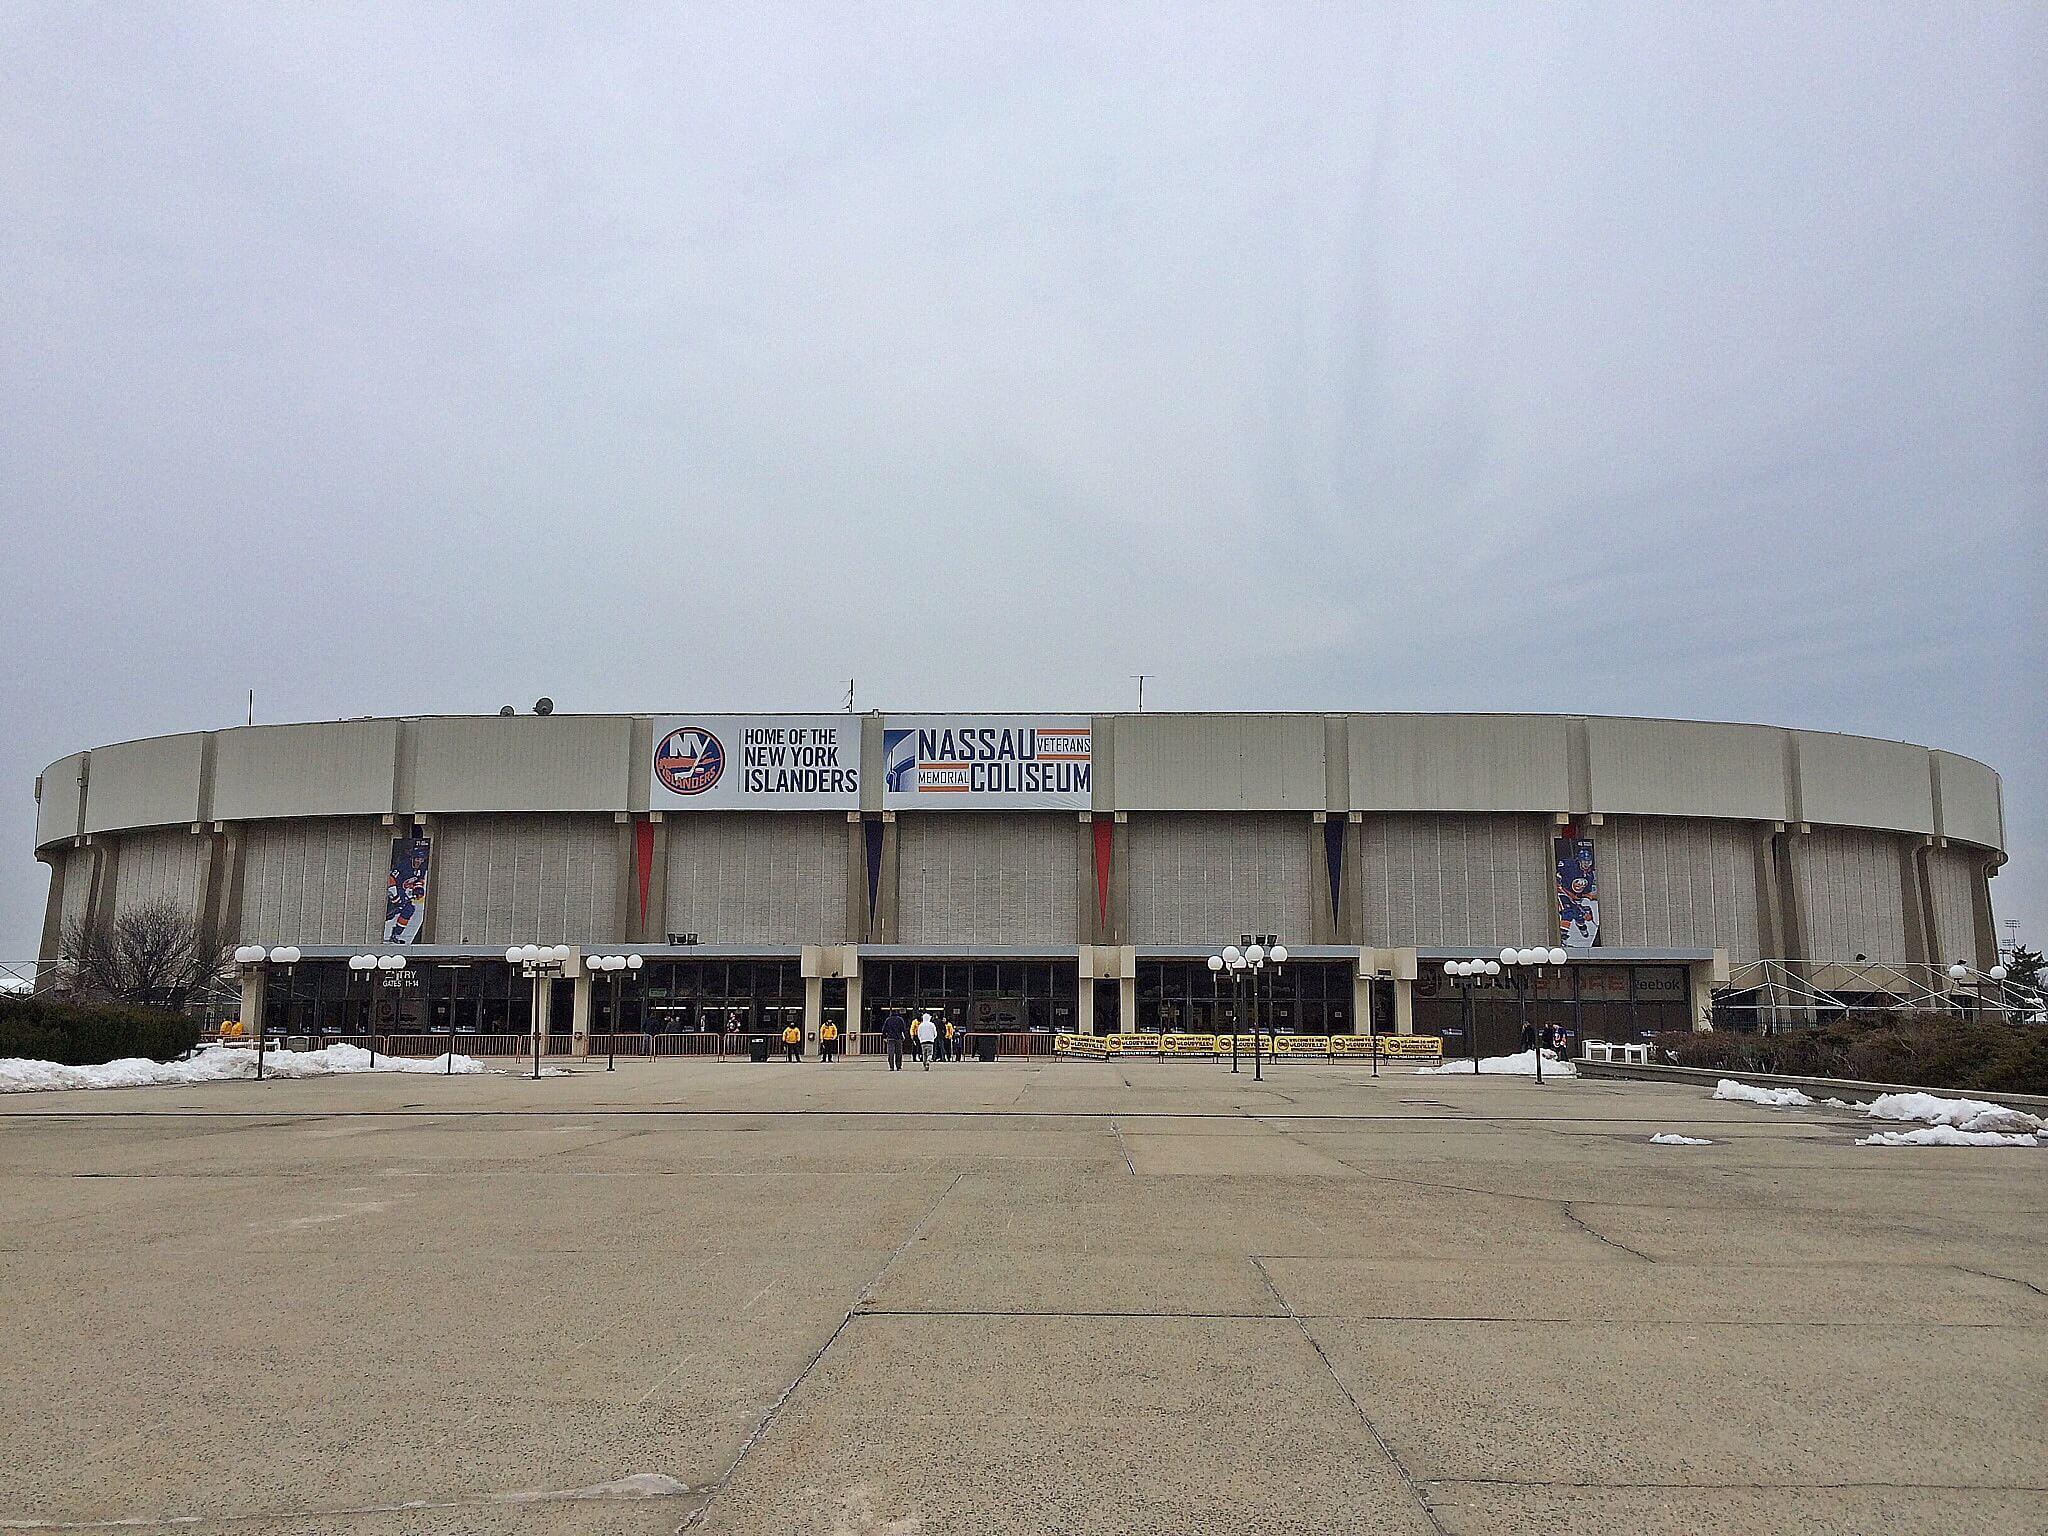 Old Nassau Coliseum